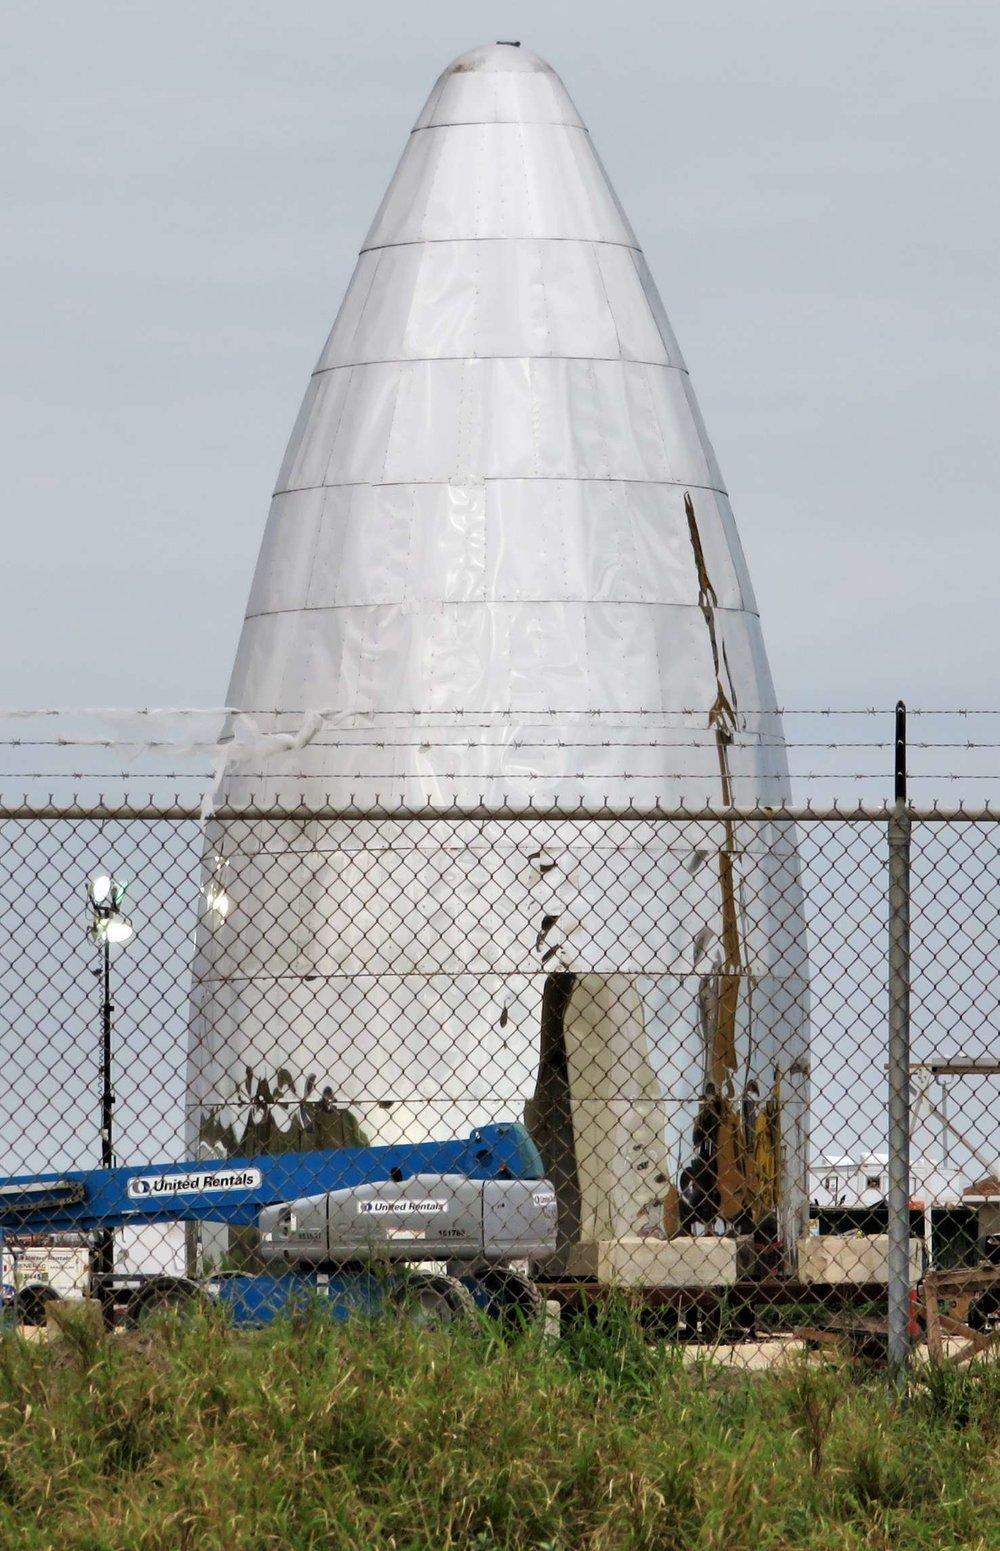 Boca-Chica-Starship-Alpha-progress-010118-NSF-bocachicagal-1c.jpg